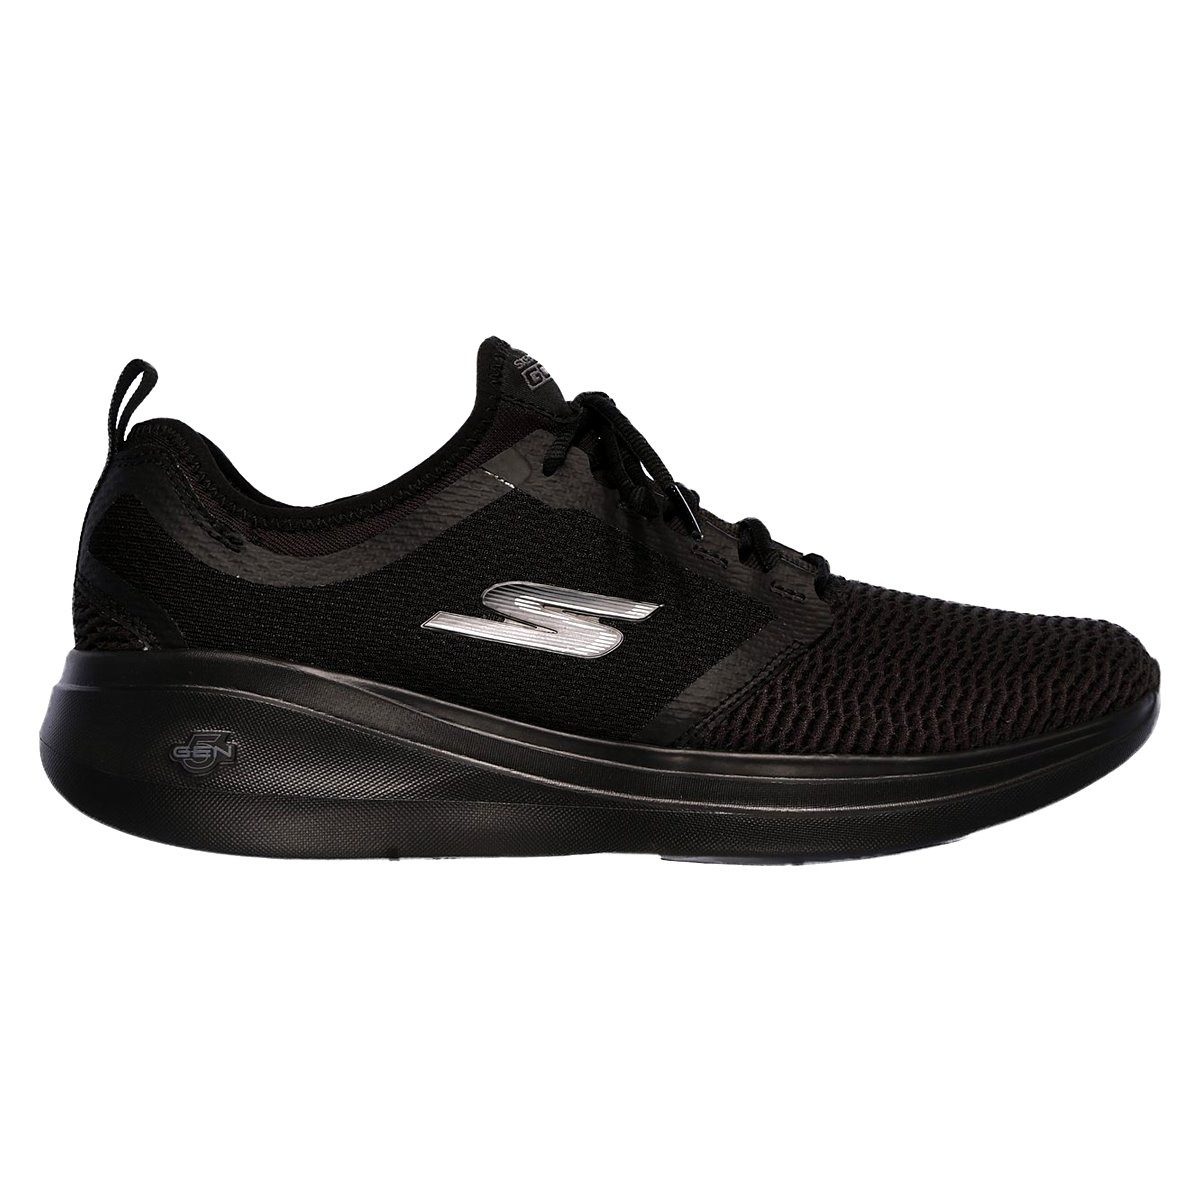 0bc7db1103f58 Tenis Skechers Go Run Fast Performance Dama Negro Comfort ...